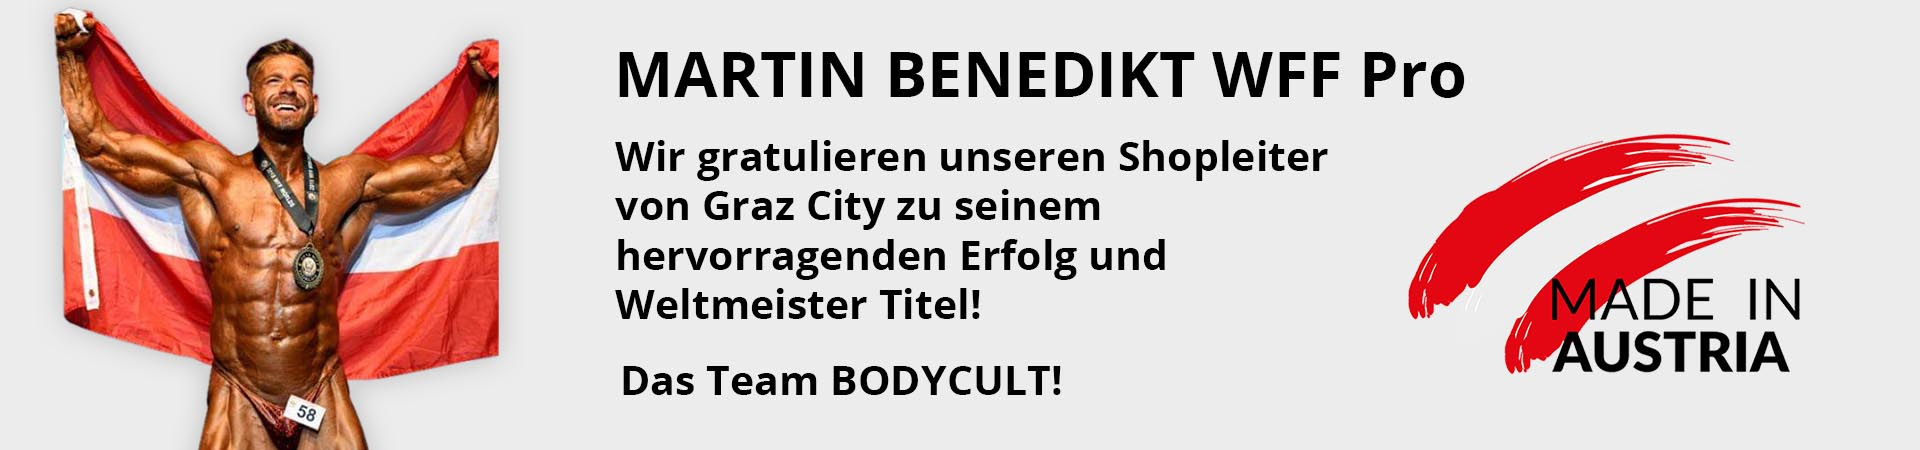 Martin Benedikt